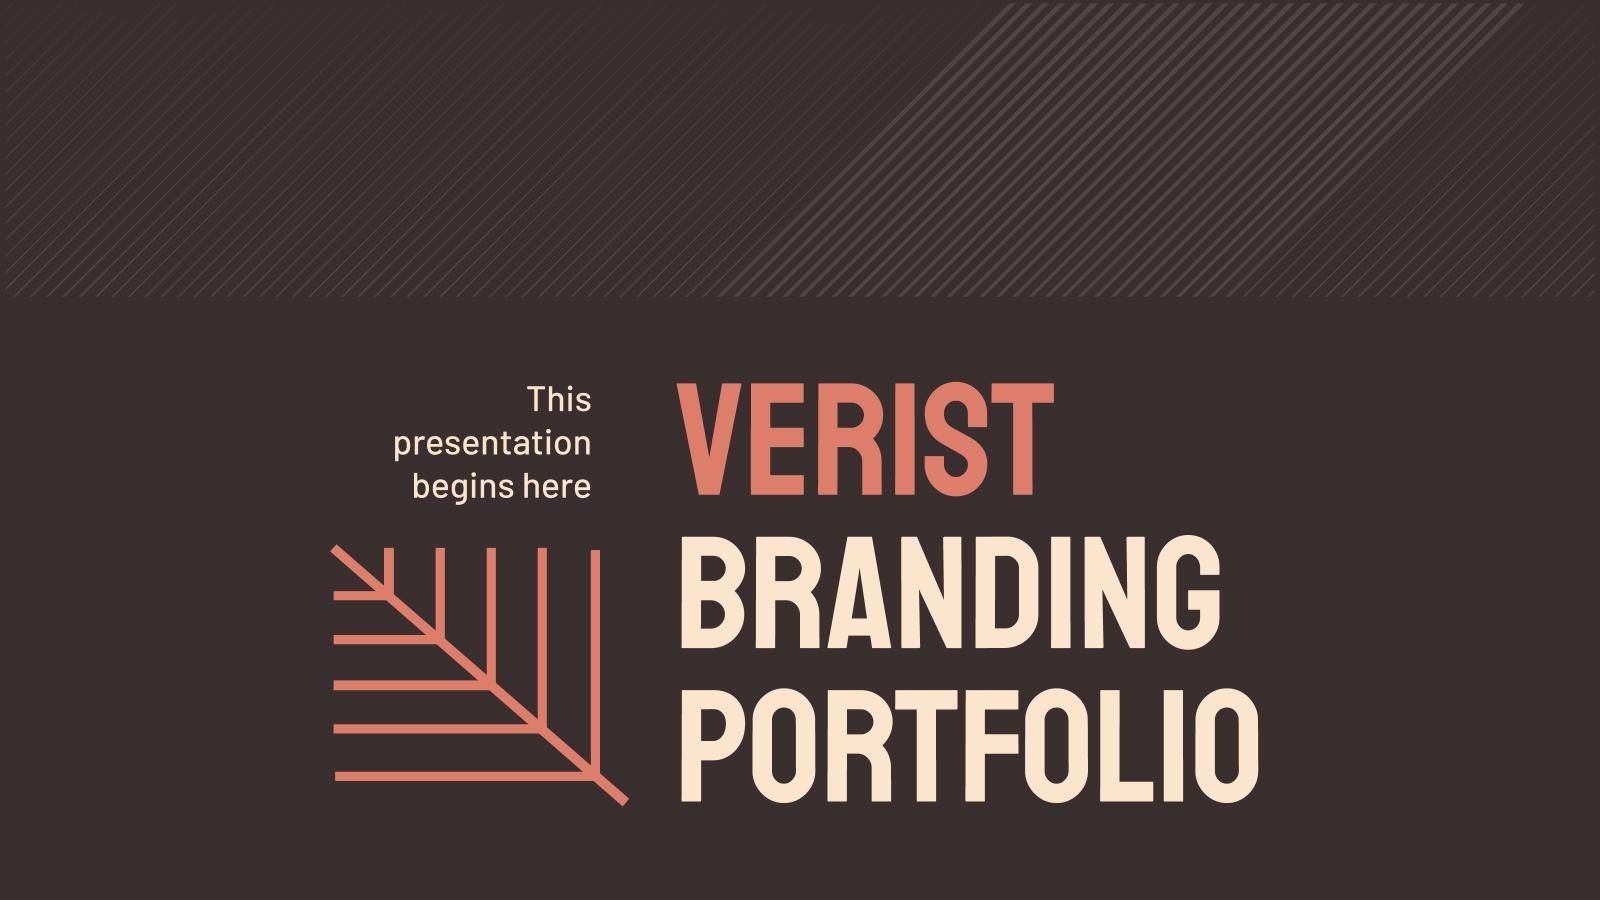 Verist Branding Portfolio presentation template